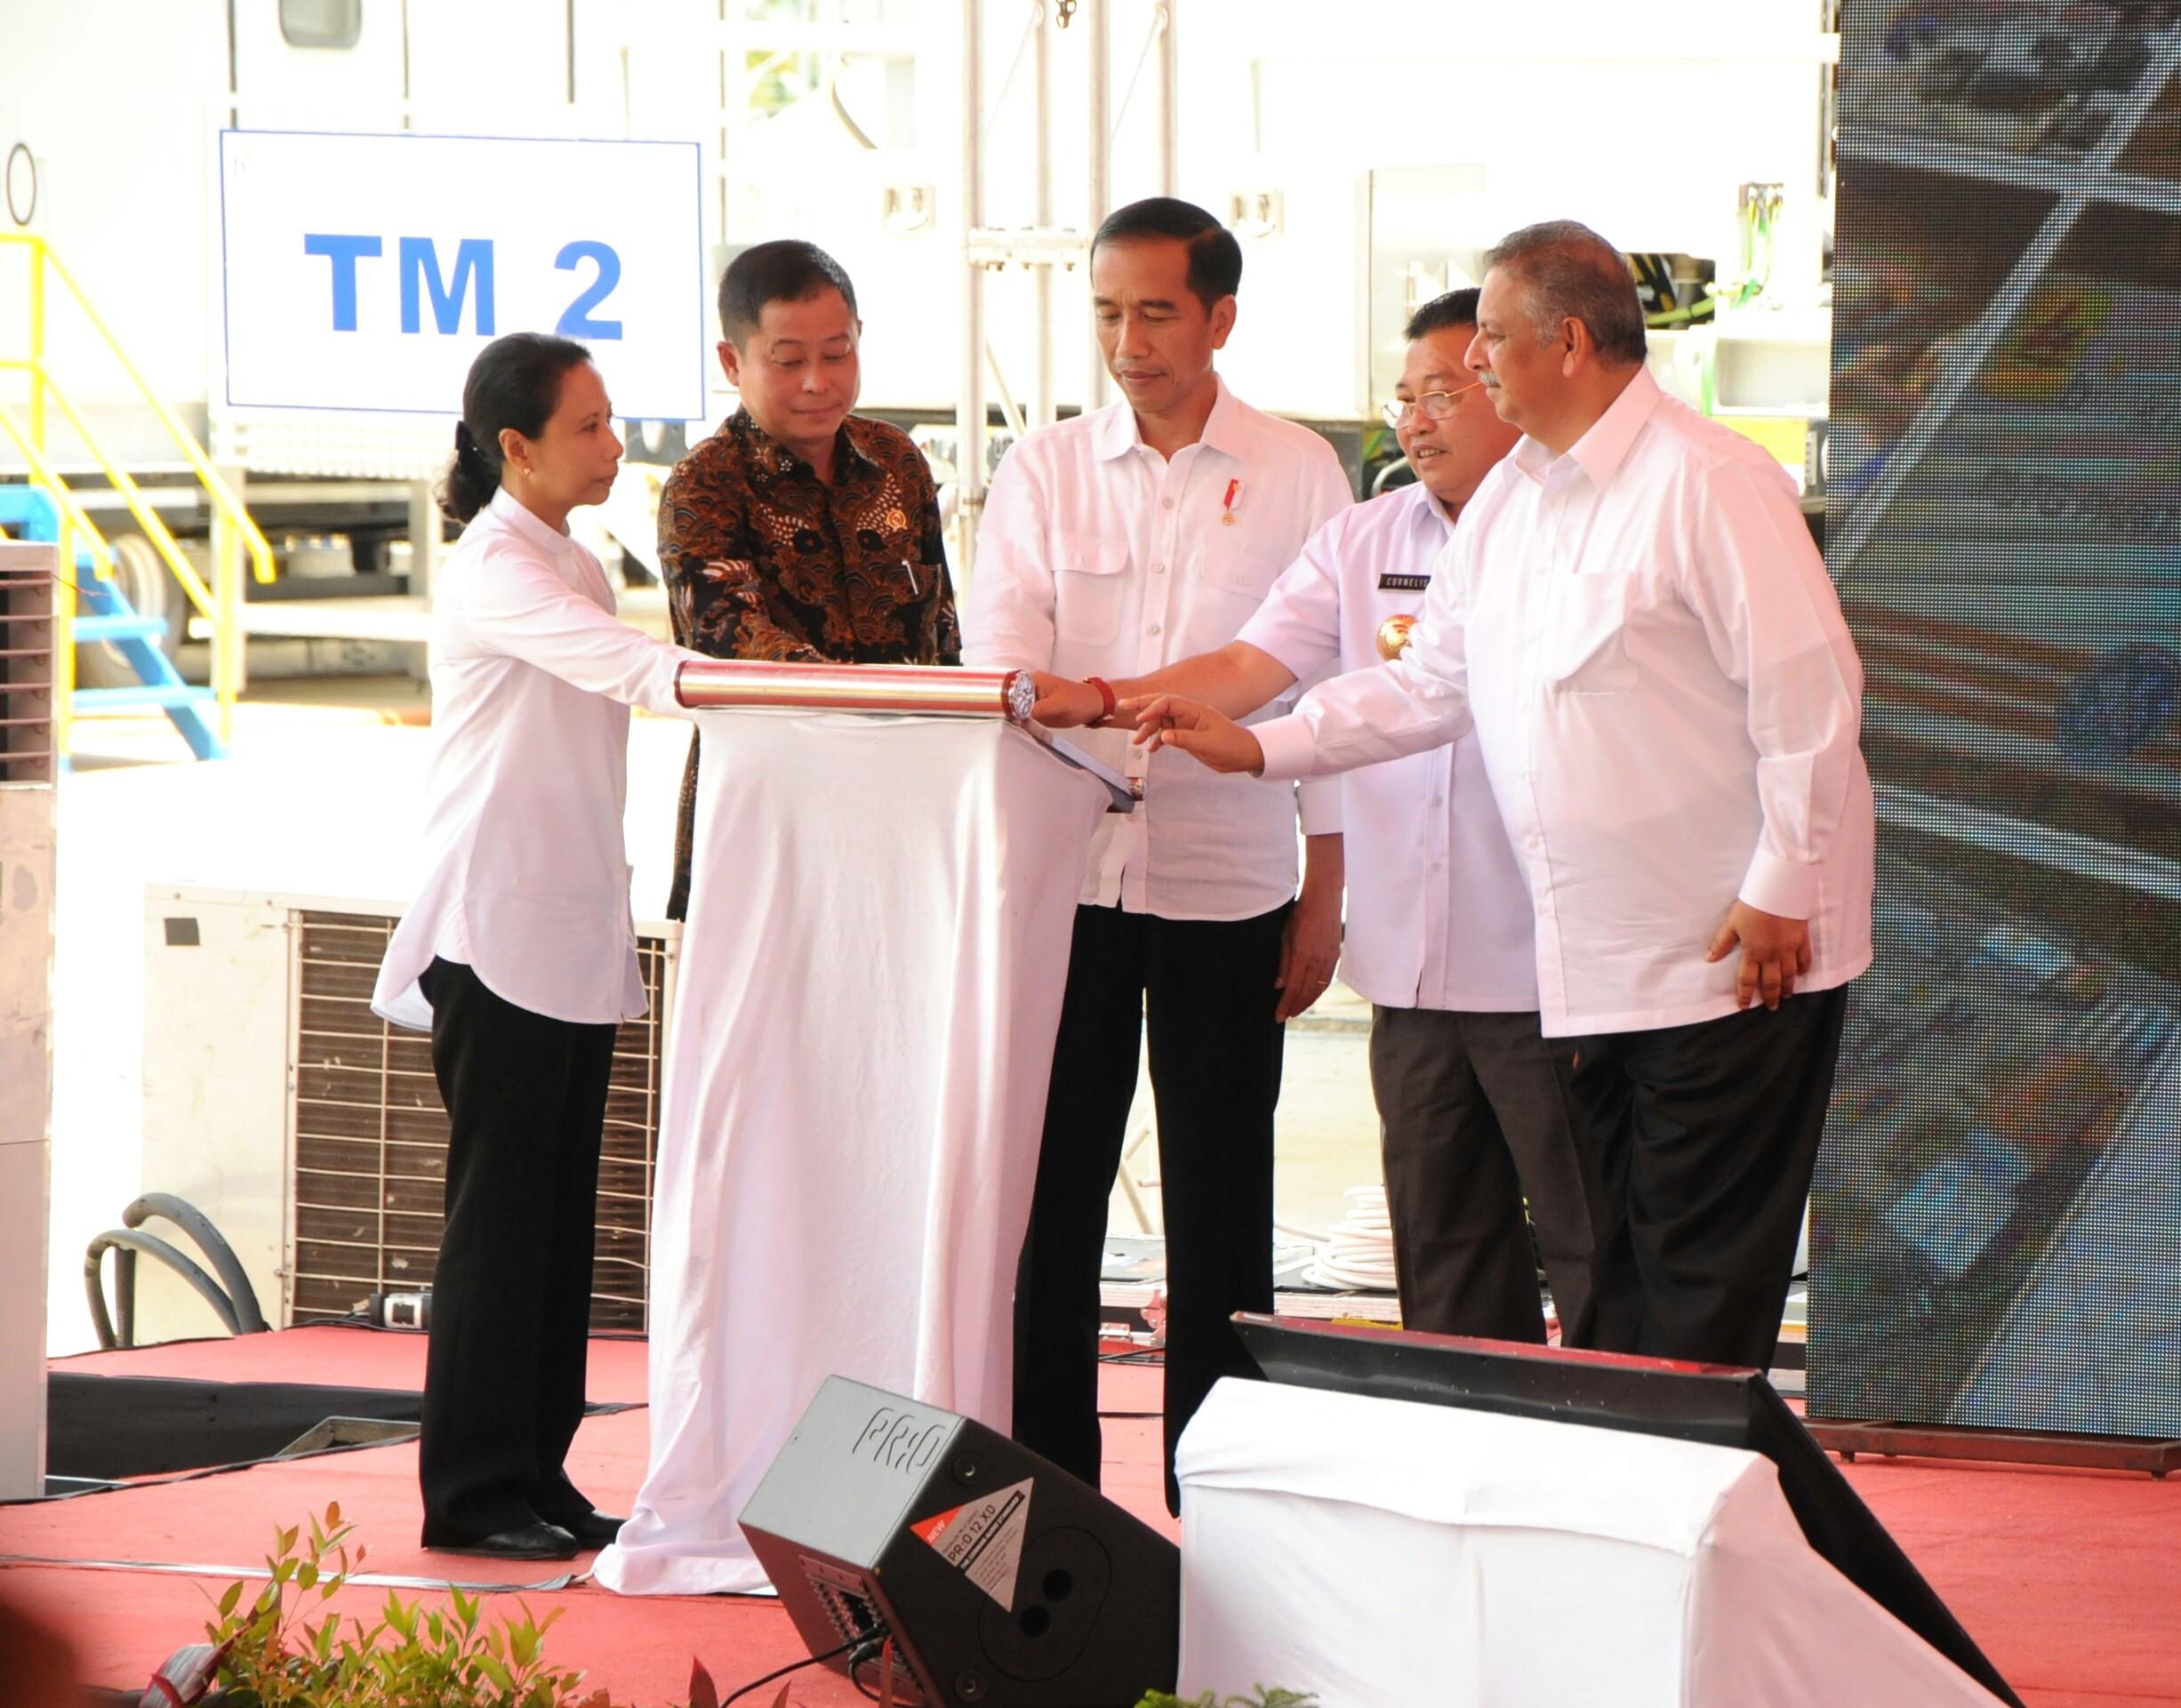 Presiden Jokowi saat memberikan sambutan pada peresmian Pembangkit Listrik Tenaga Gas Mobile Power Plant (PLTG MPP) Parit Baru 4 X 25 MW, di Kabupaten Mempawah, Kalimantan Barat (Kalbar), Sabtu (18/3) siang. (Foto: Humas/Rahmat)